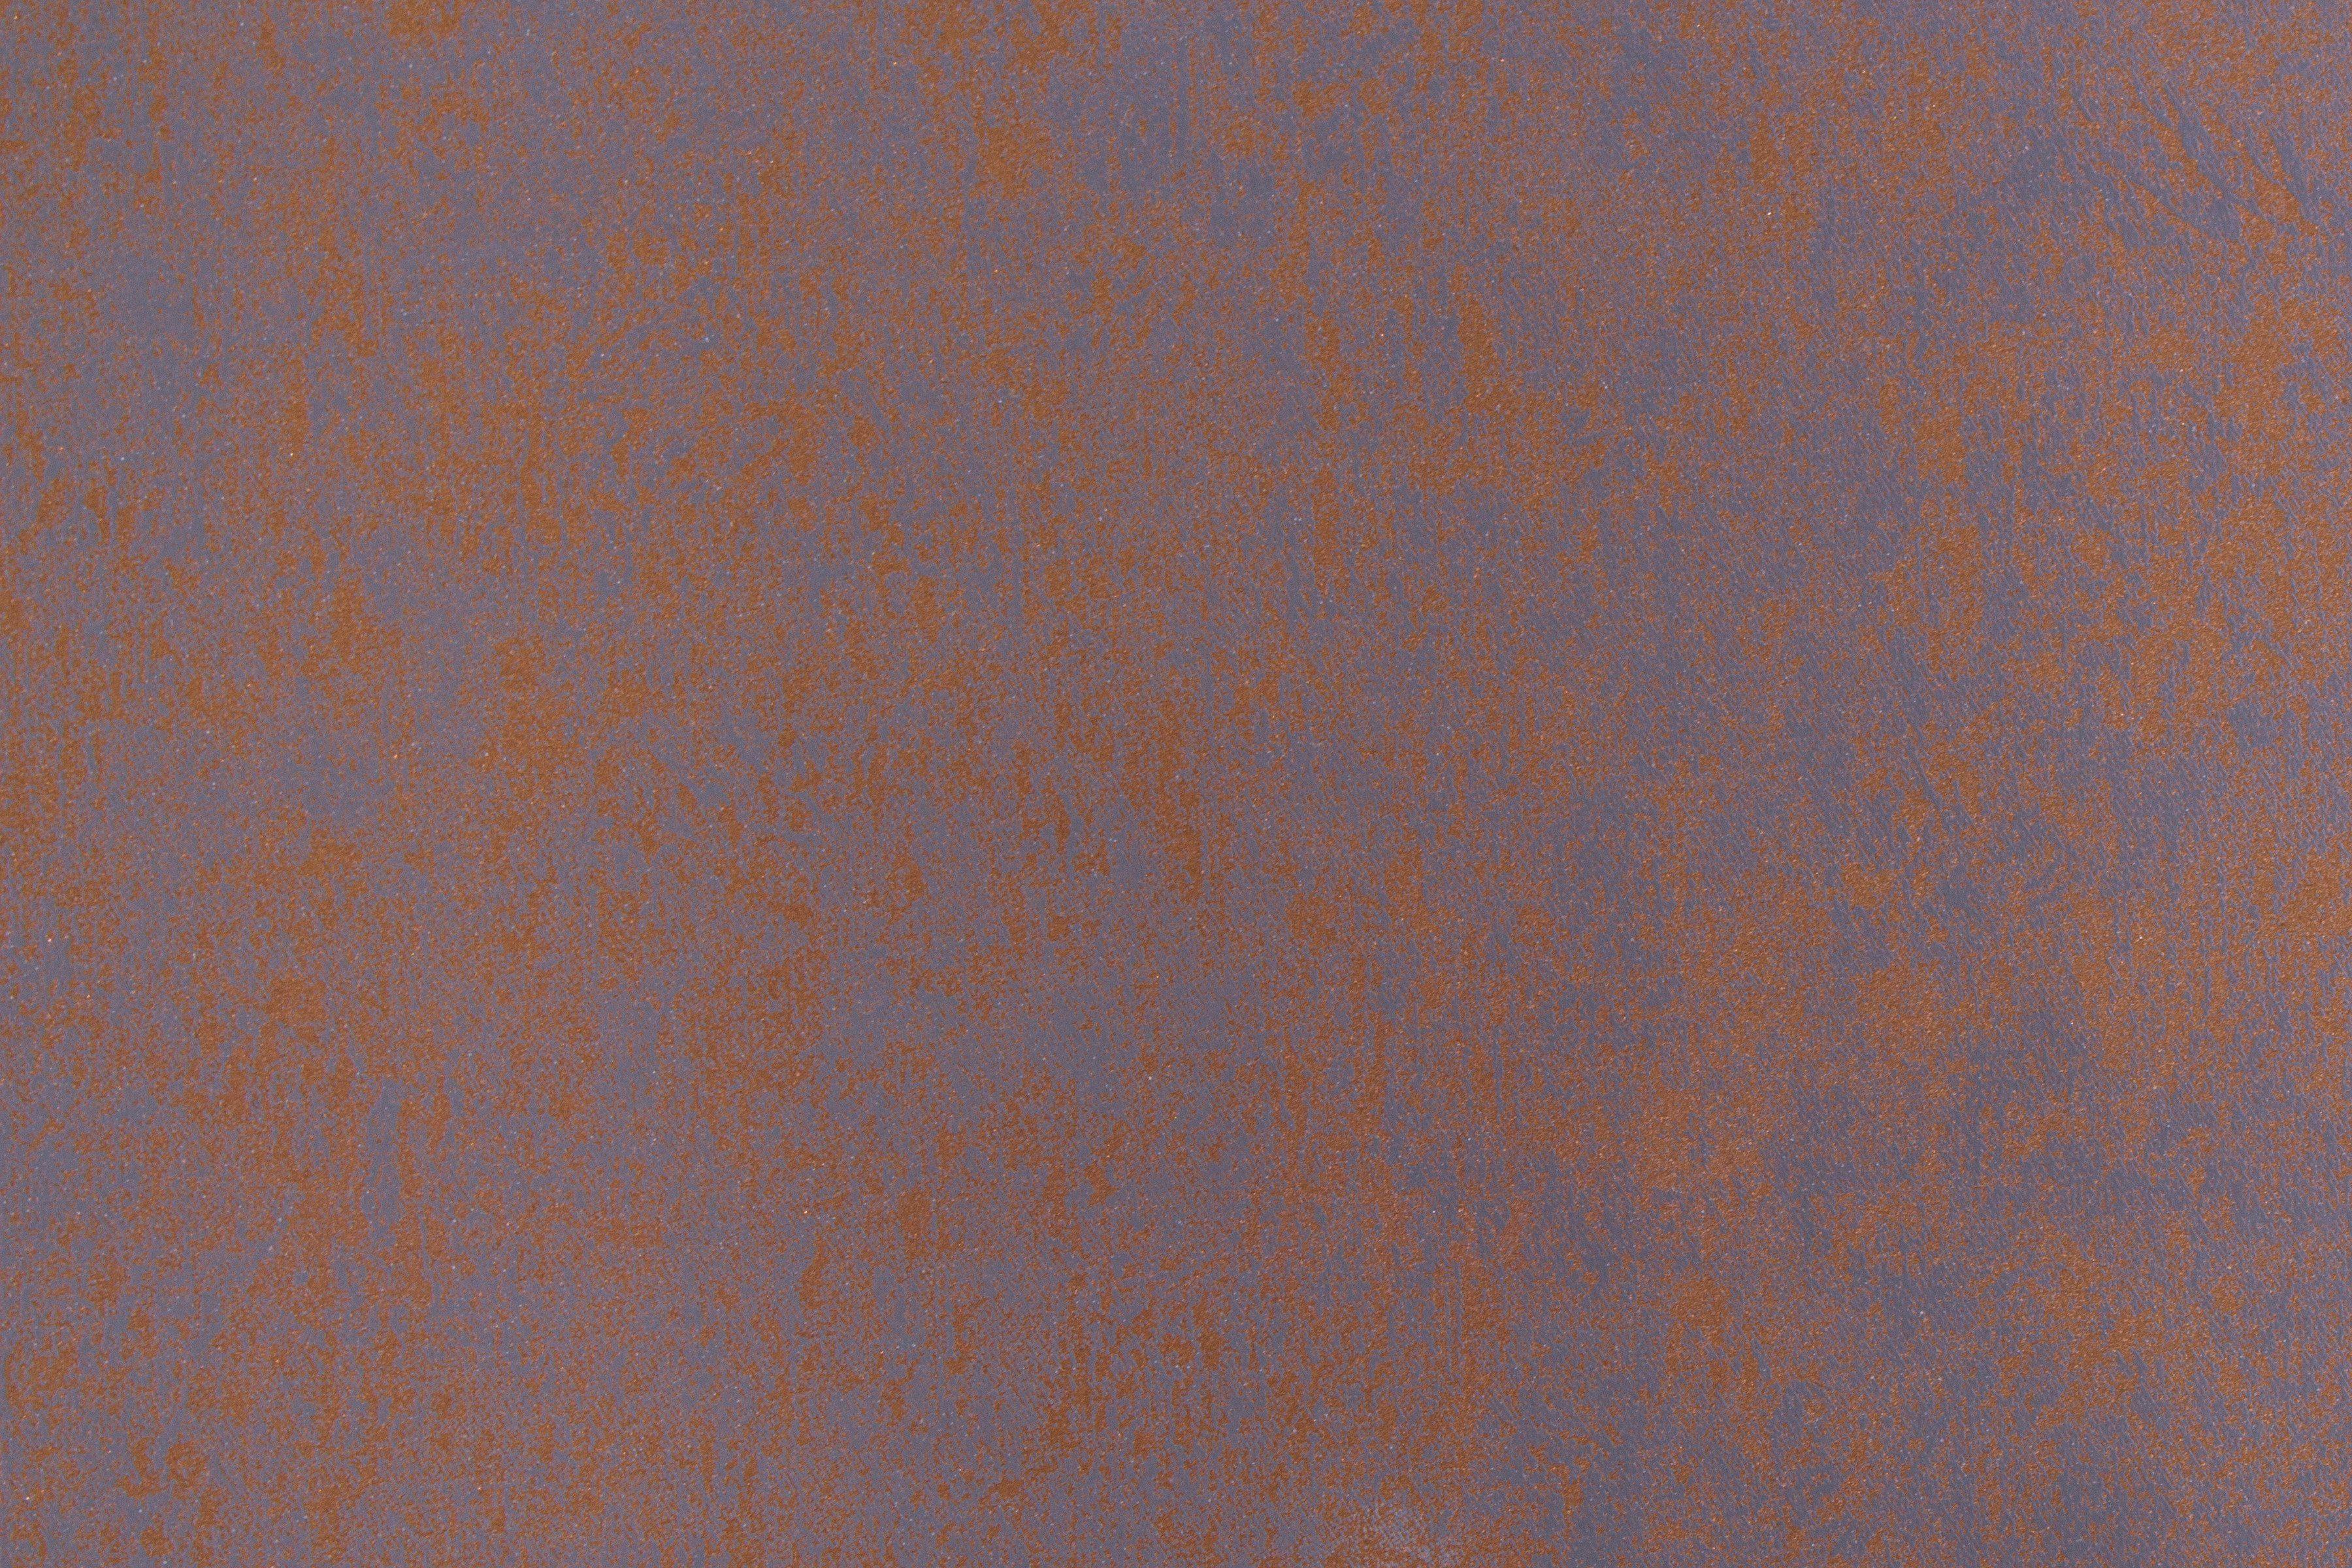 Vliestapete »Estelle«, bronze